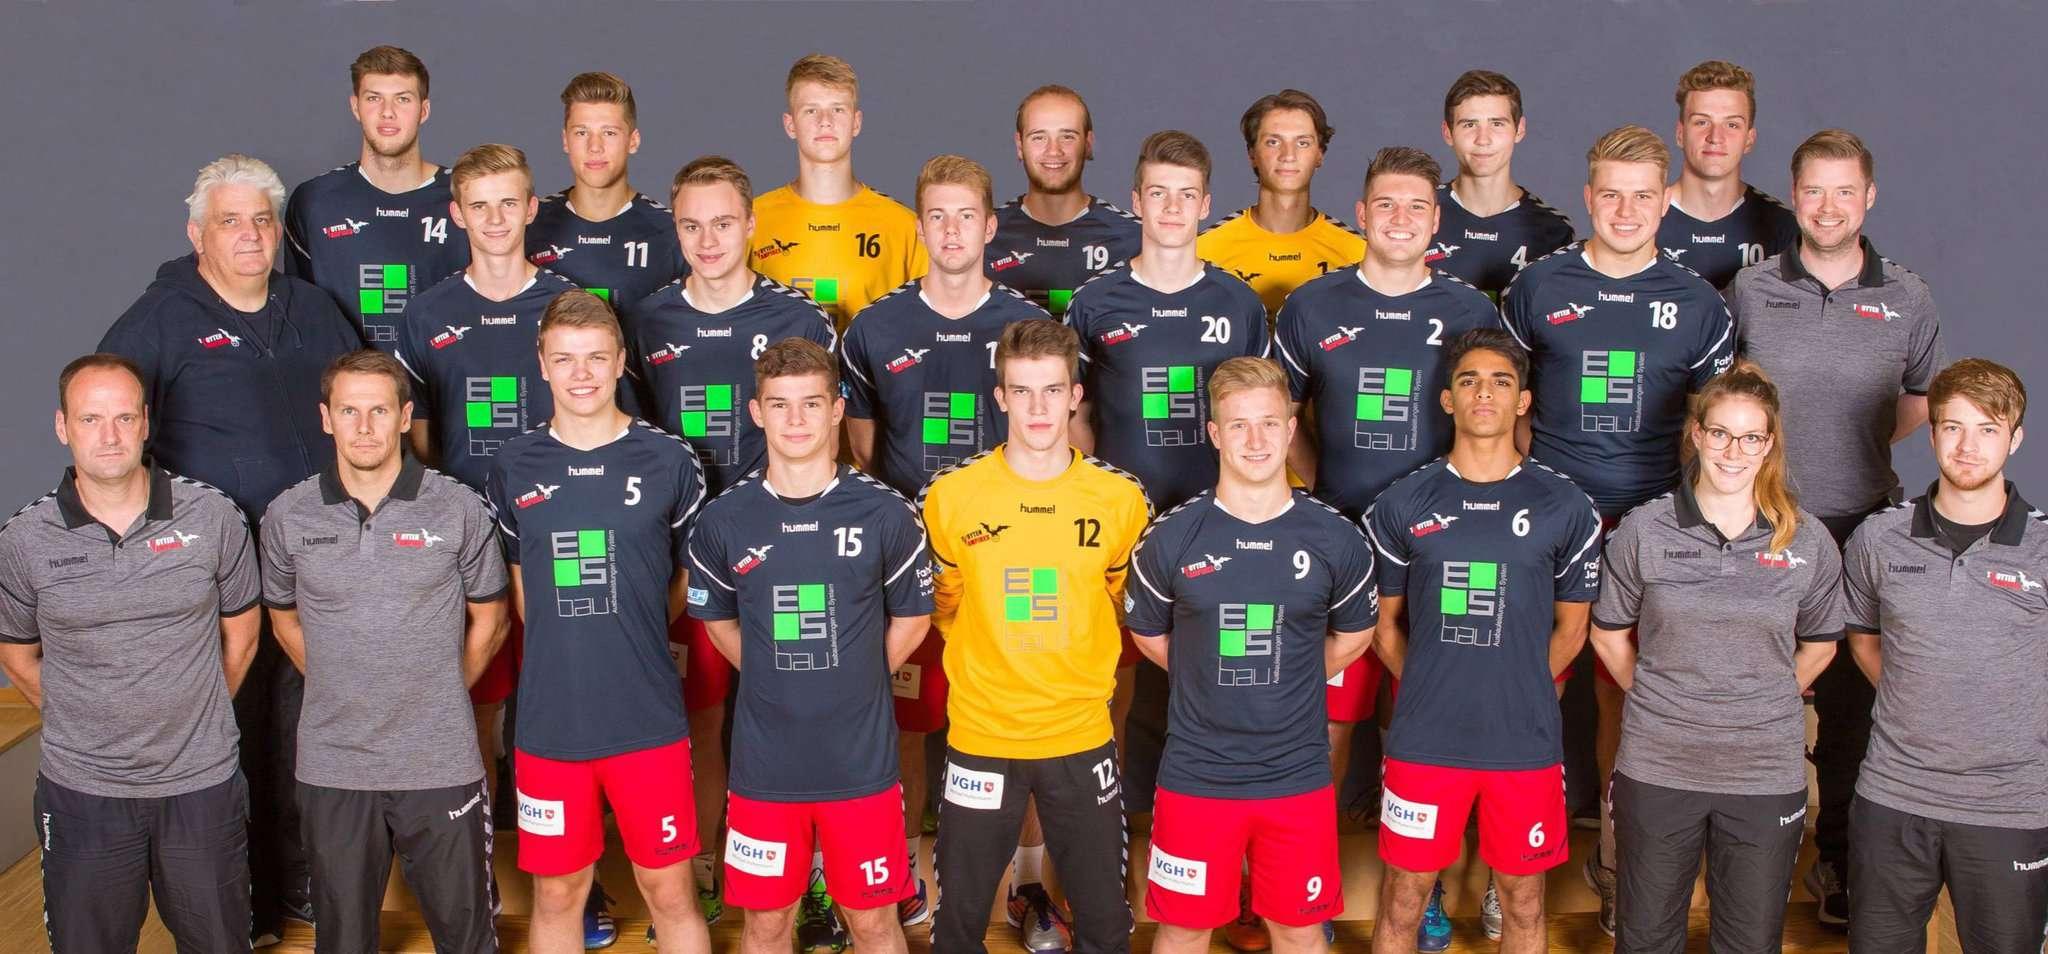 Die A-Jugend der Bassener Handballer Foto:www.ivent-foto.de